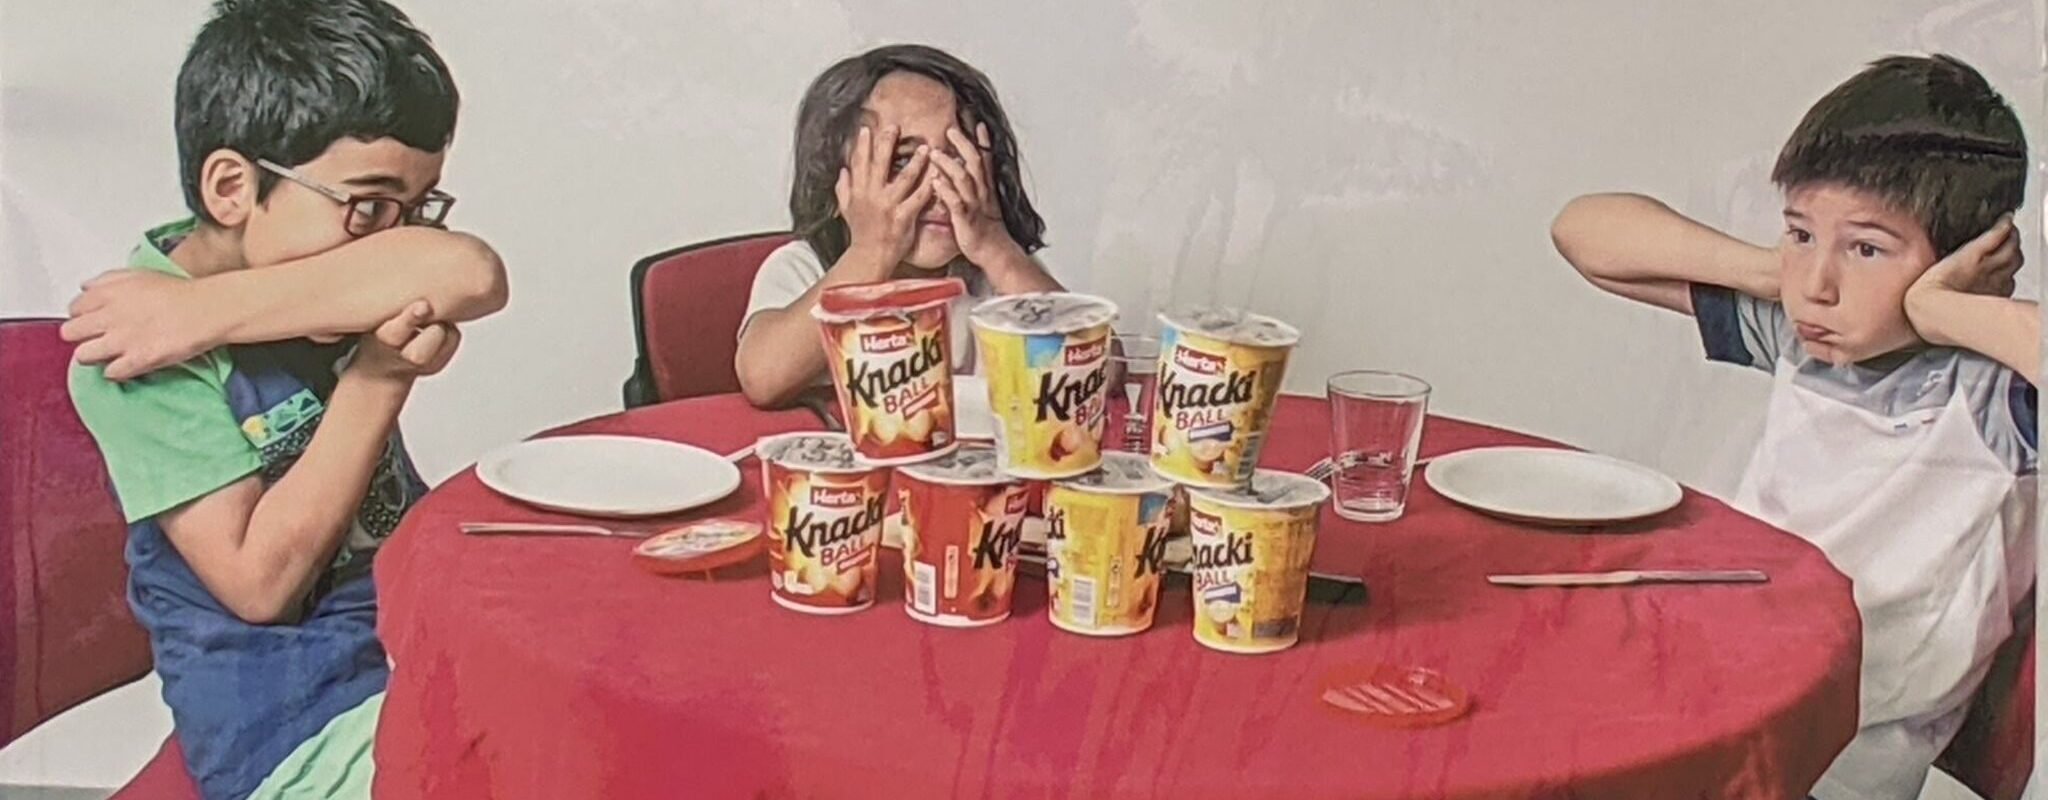 Infiltré chez Herta: pourquoi je ne mangerai plus ni jambon industriel, ni knacki